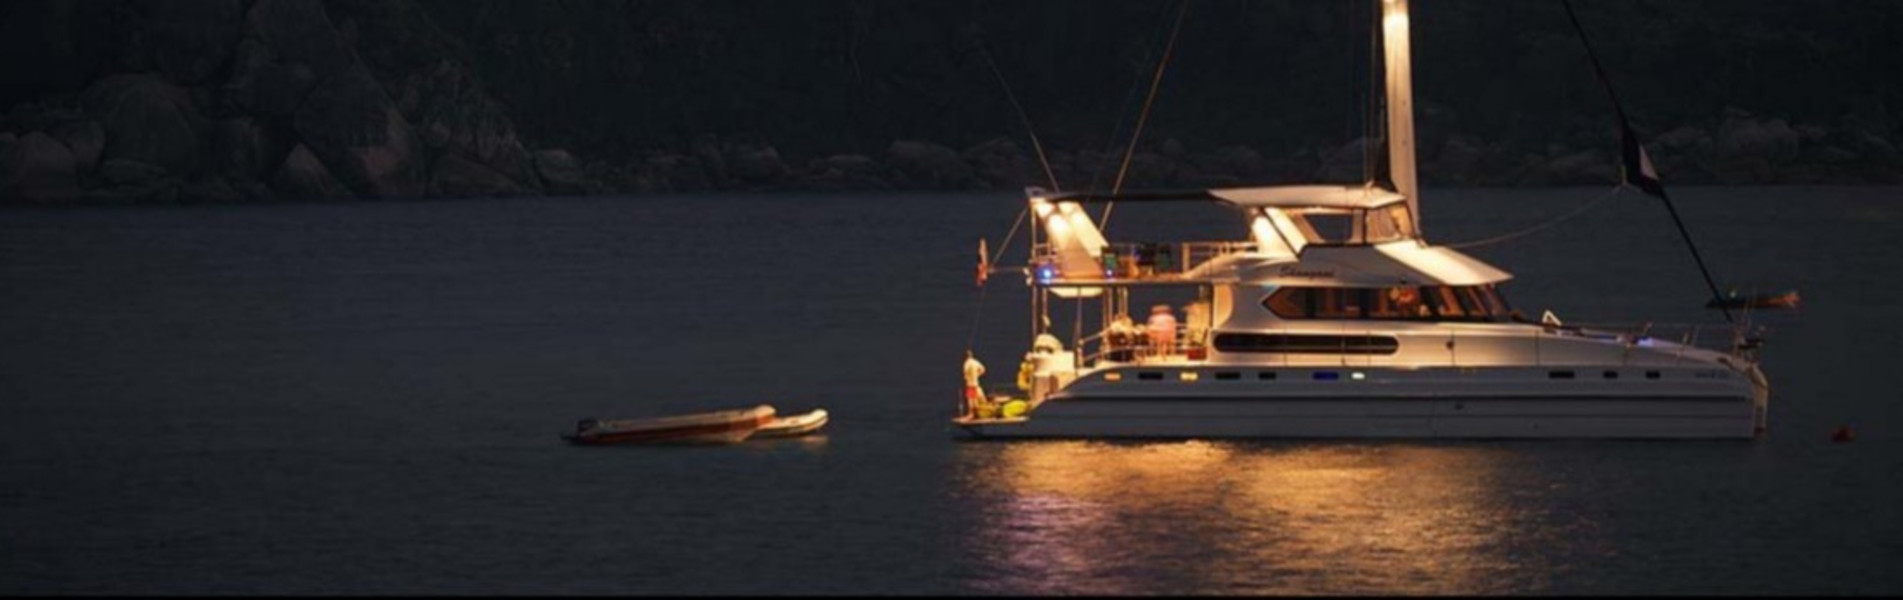 Overnight Luxury Catamaran Charter Tour